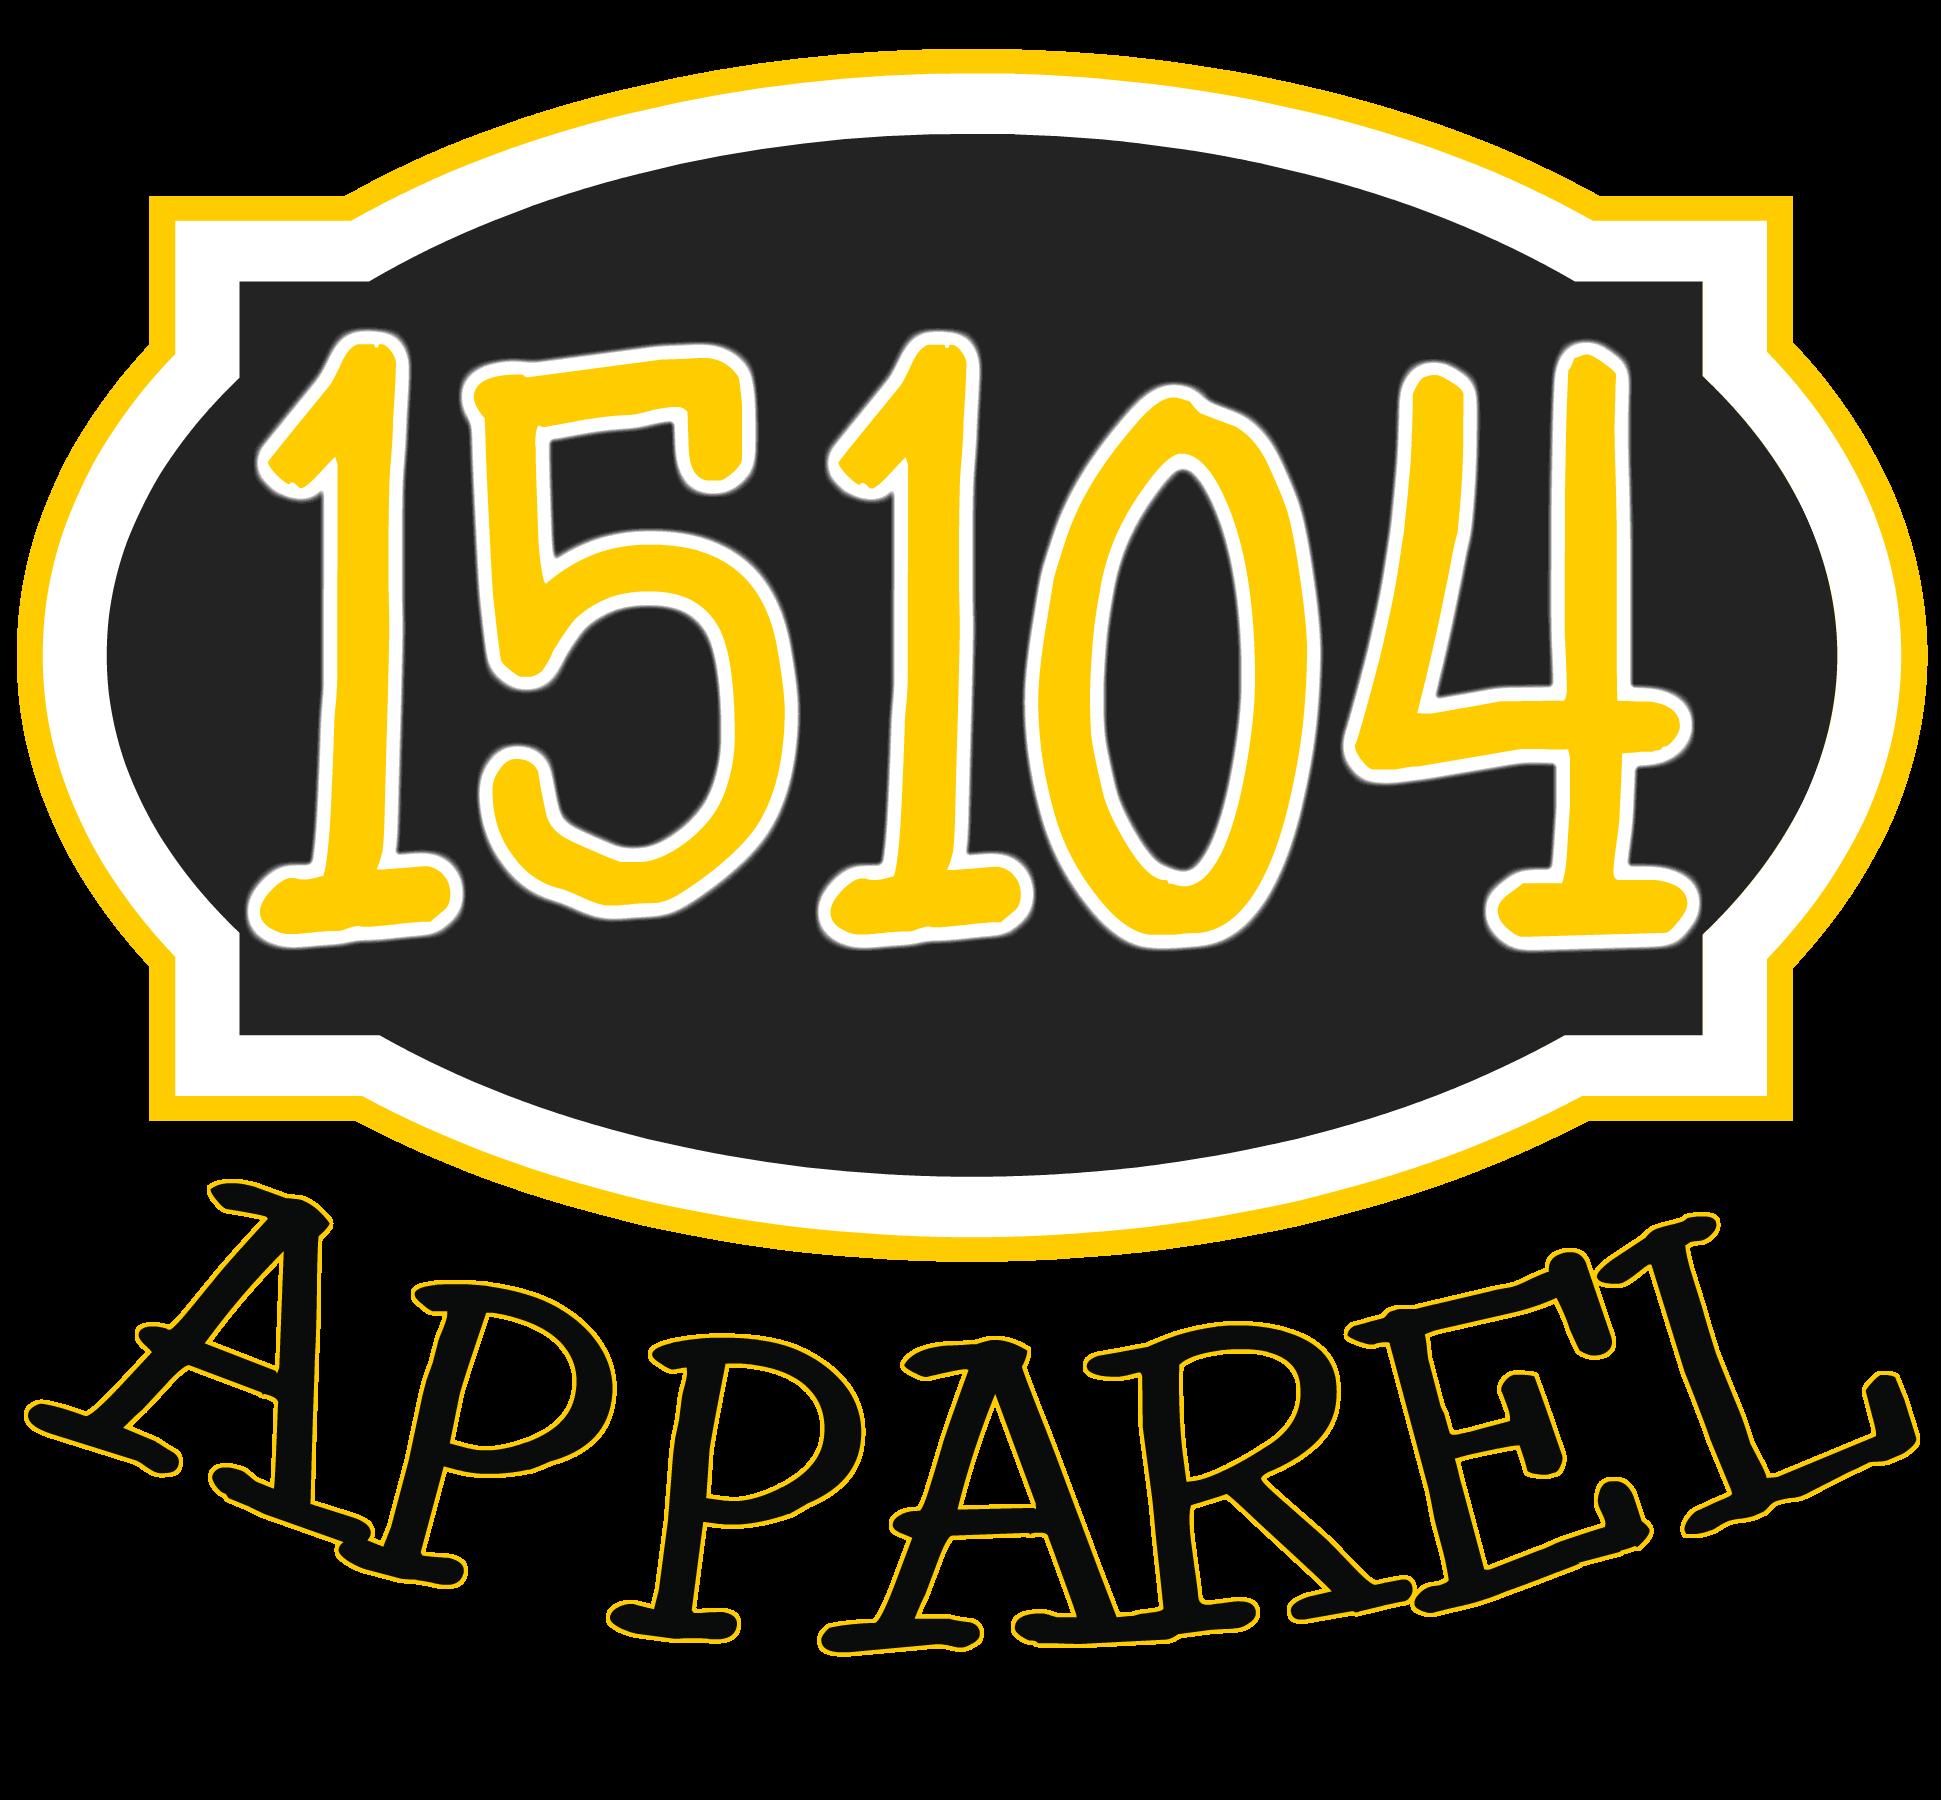 15104APPAREL